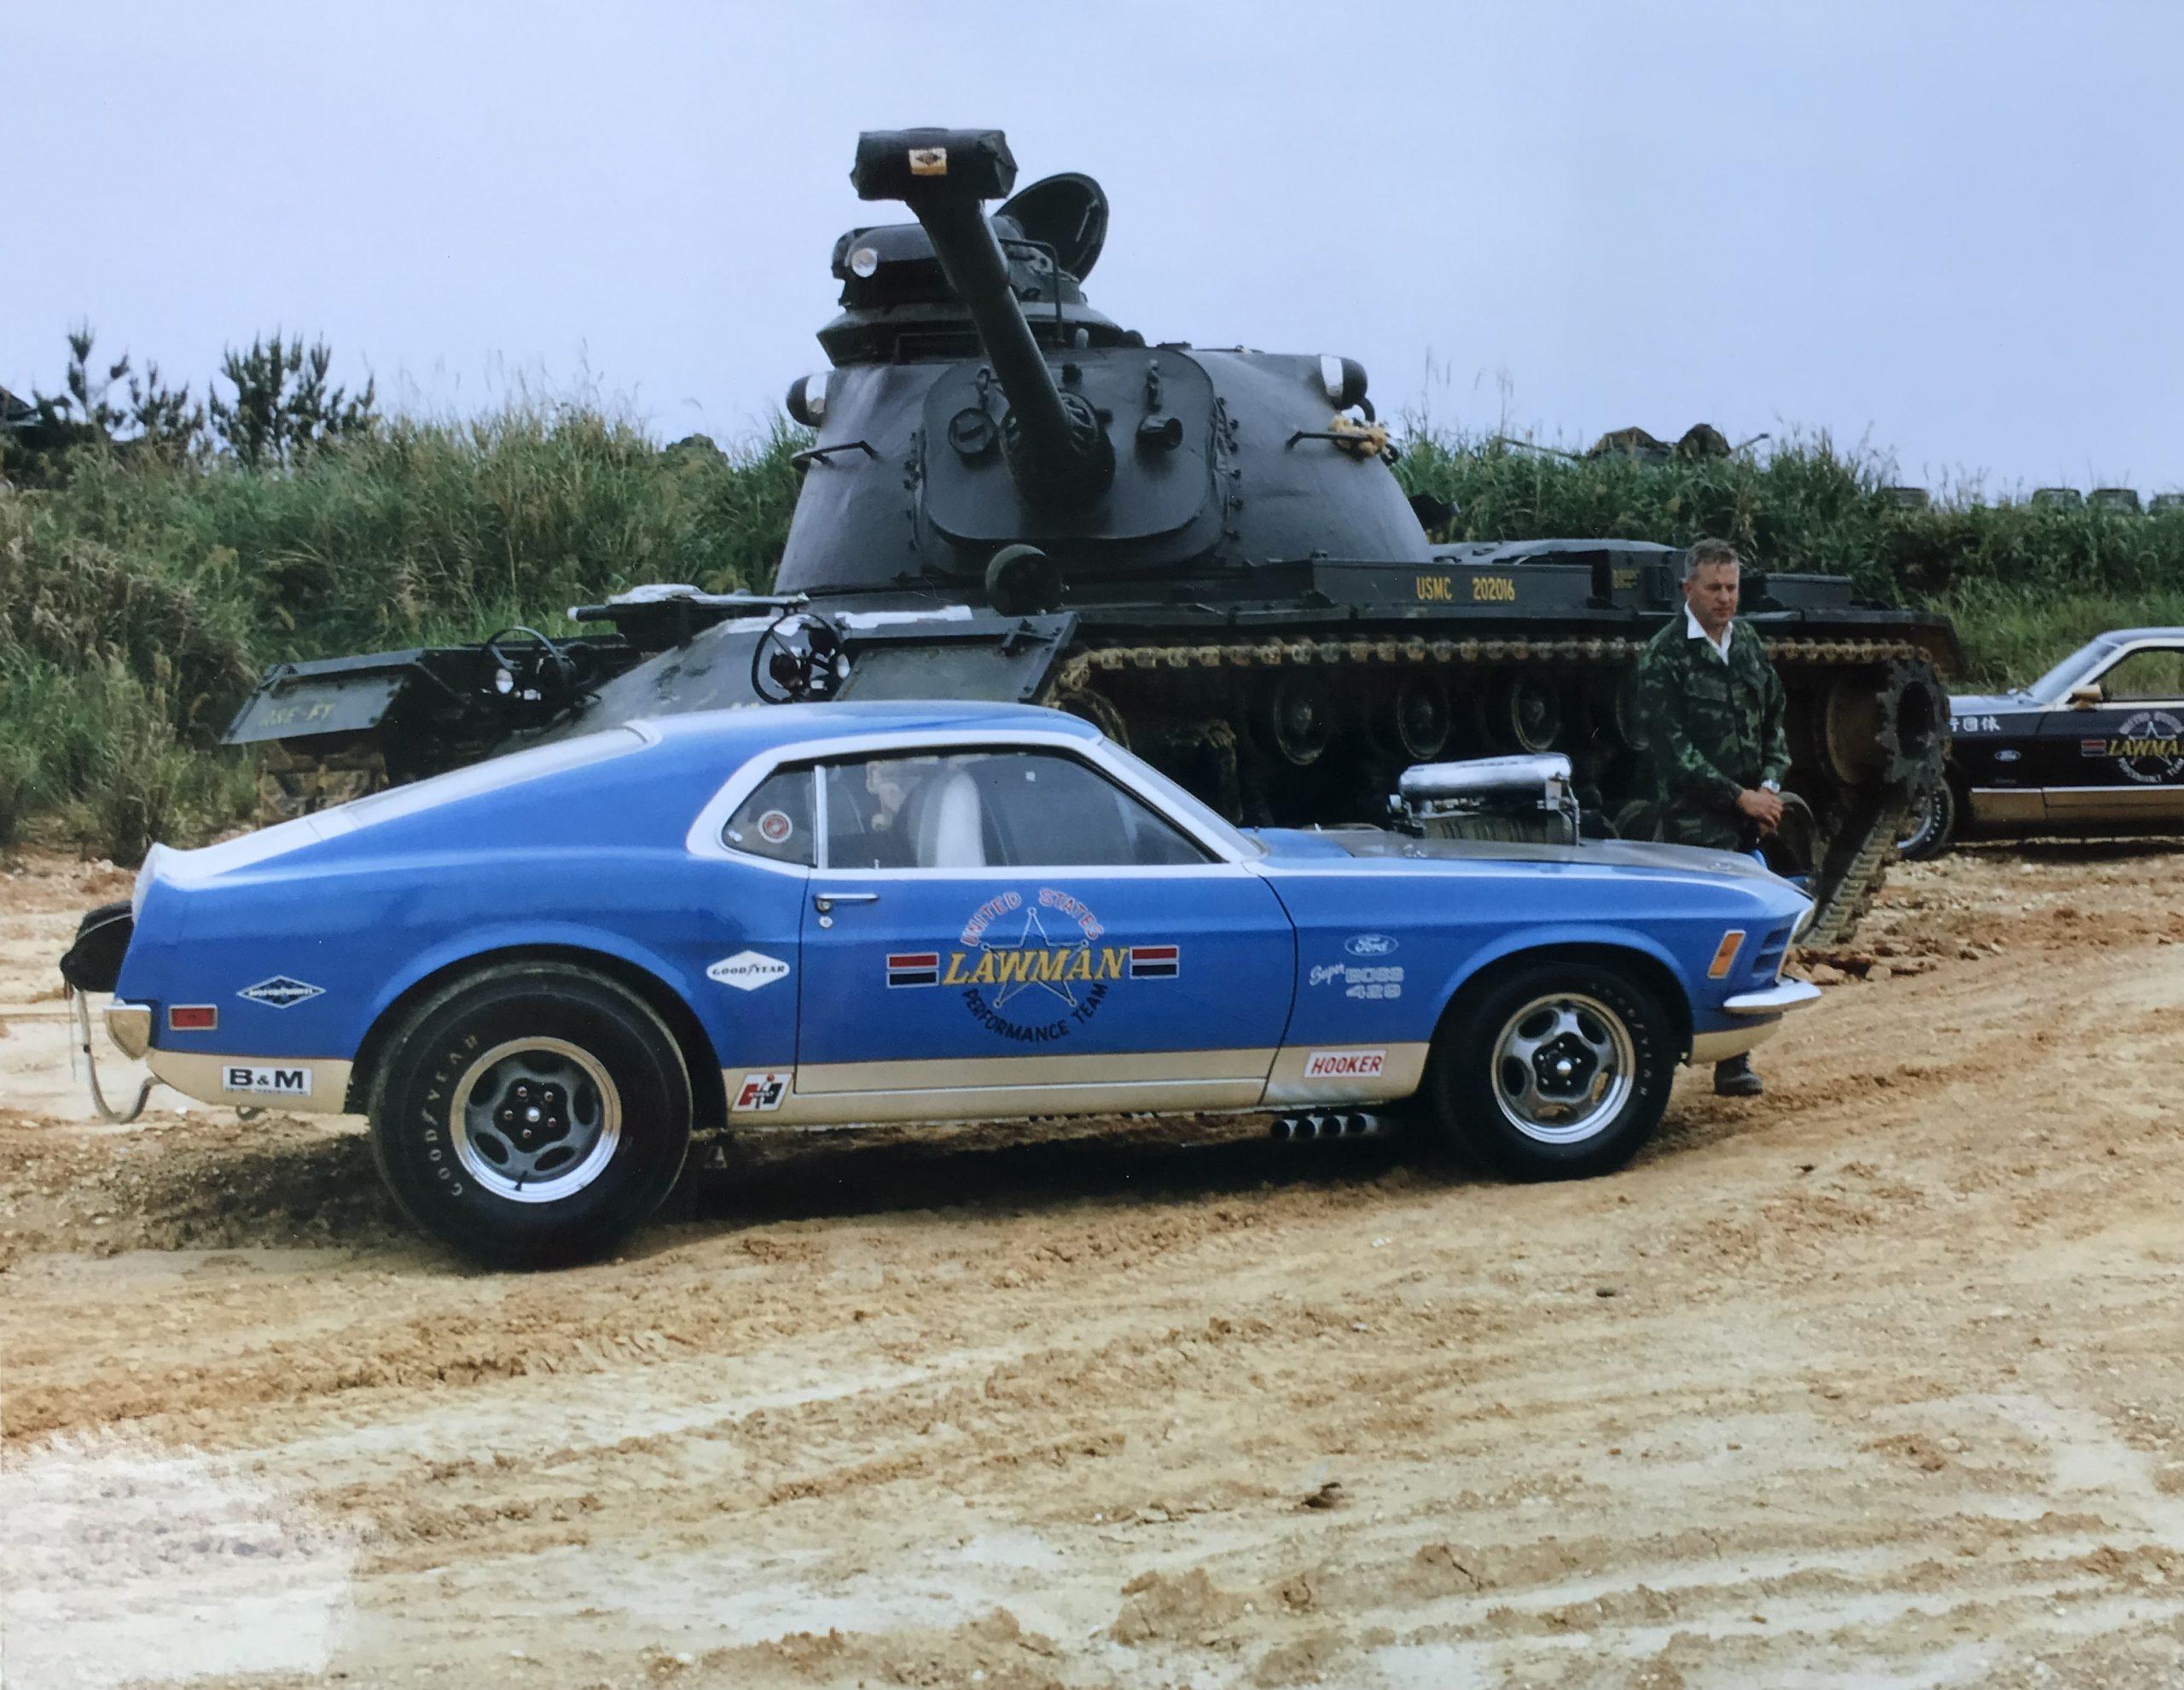 Lawman Boss 429 Ford Mustang historical car beside USMC battle tank